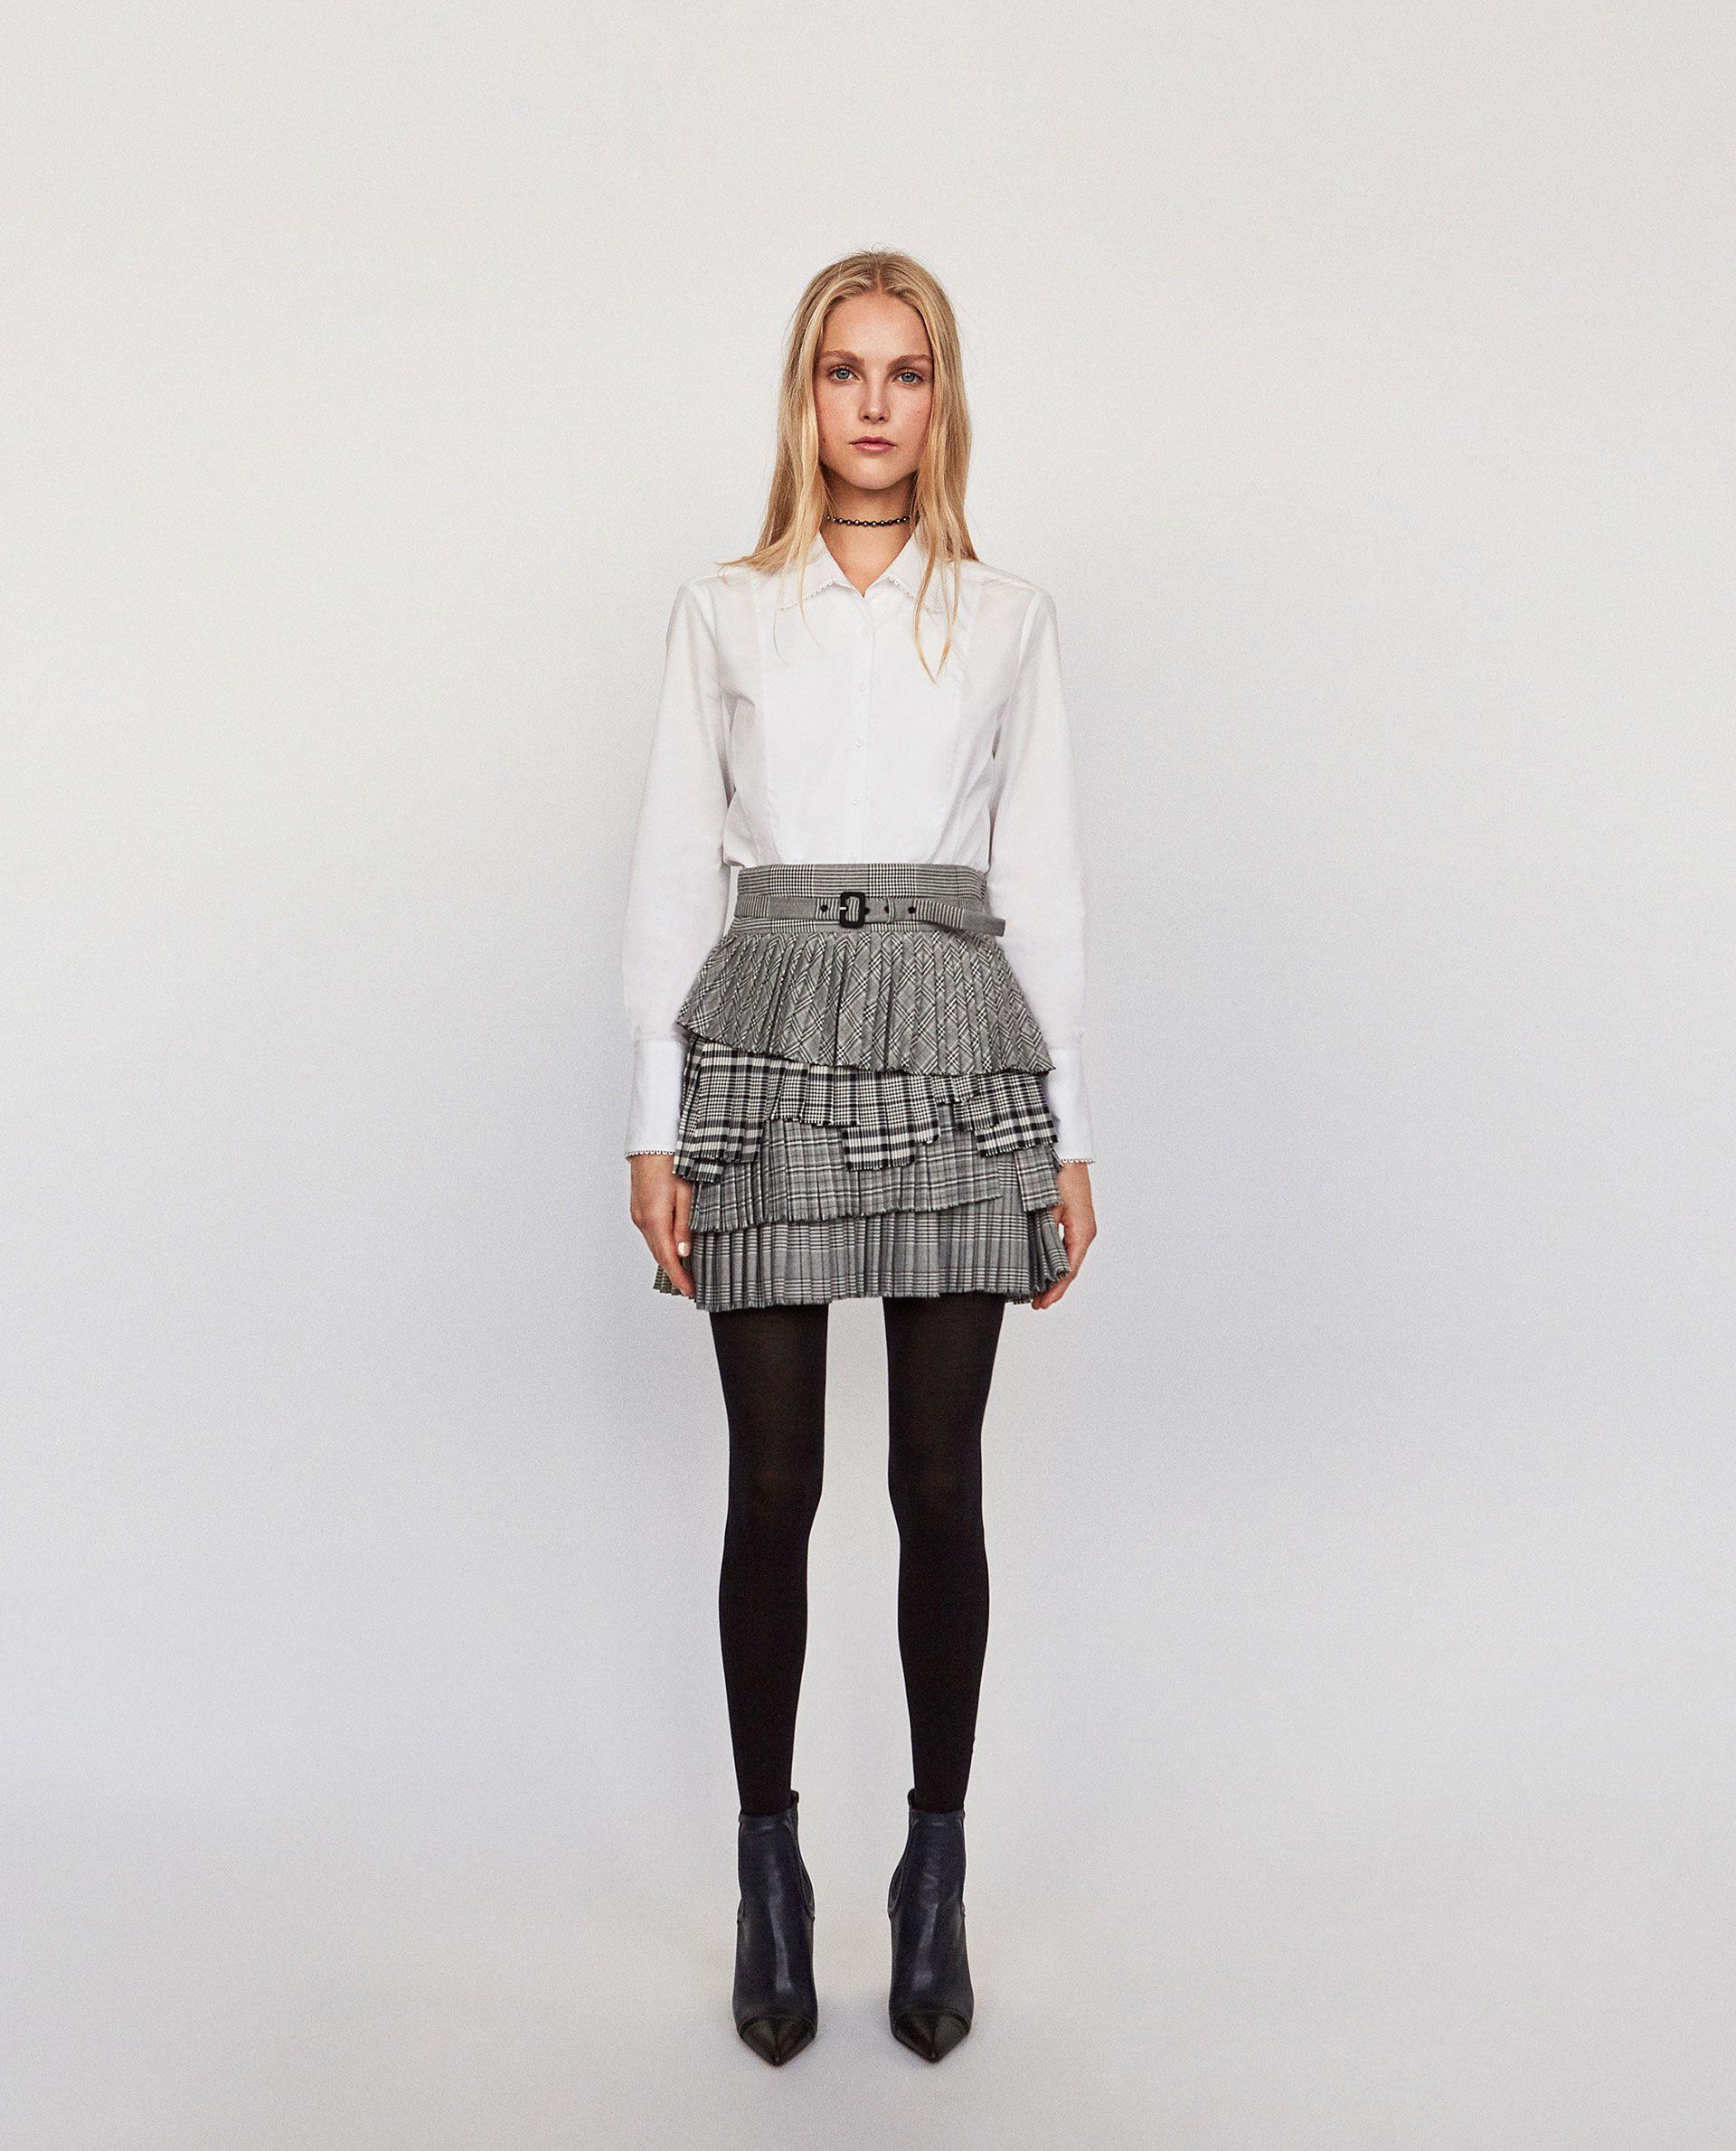 e475f4a62 FALDA PLISADA TABLAS | Style | Faldas plisadas, Camisas peplum y Faldas